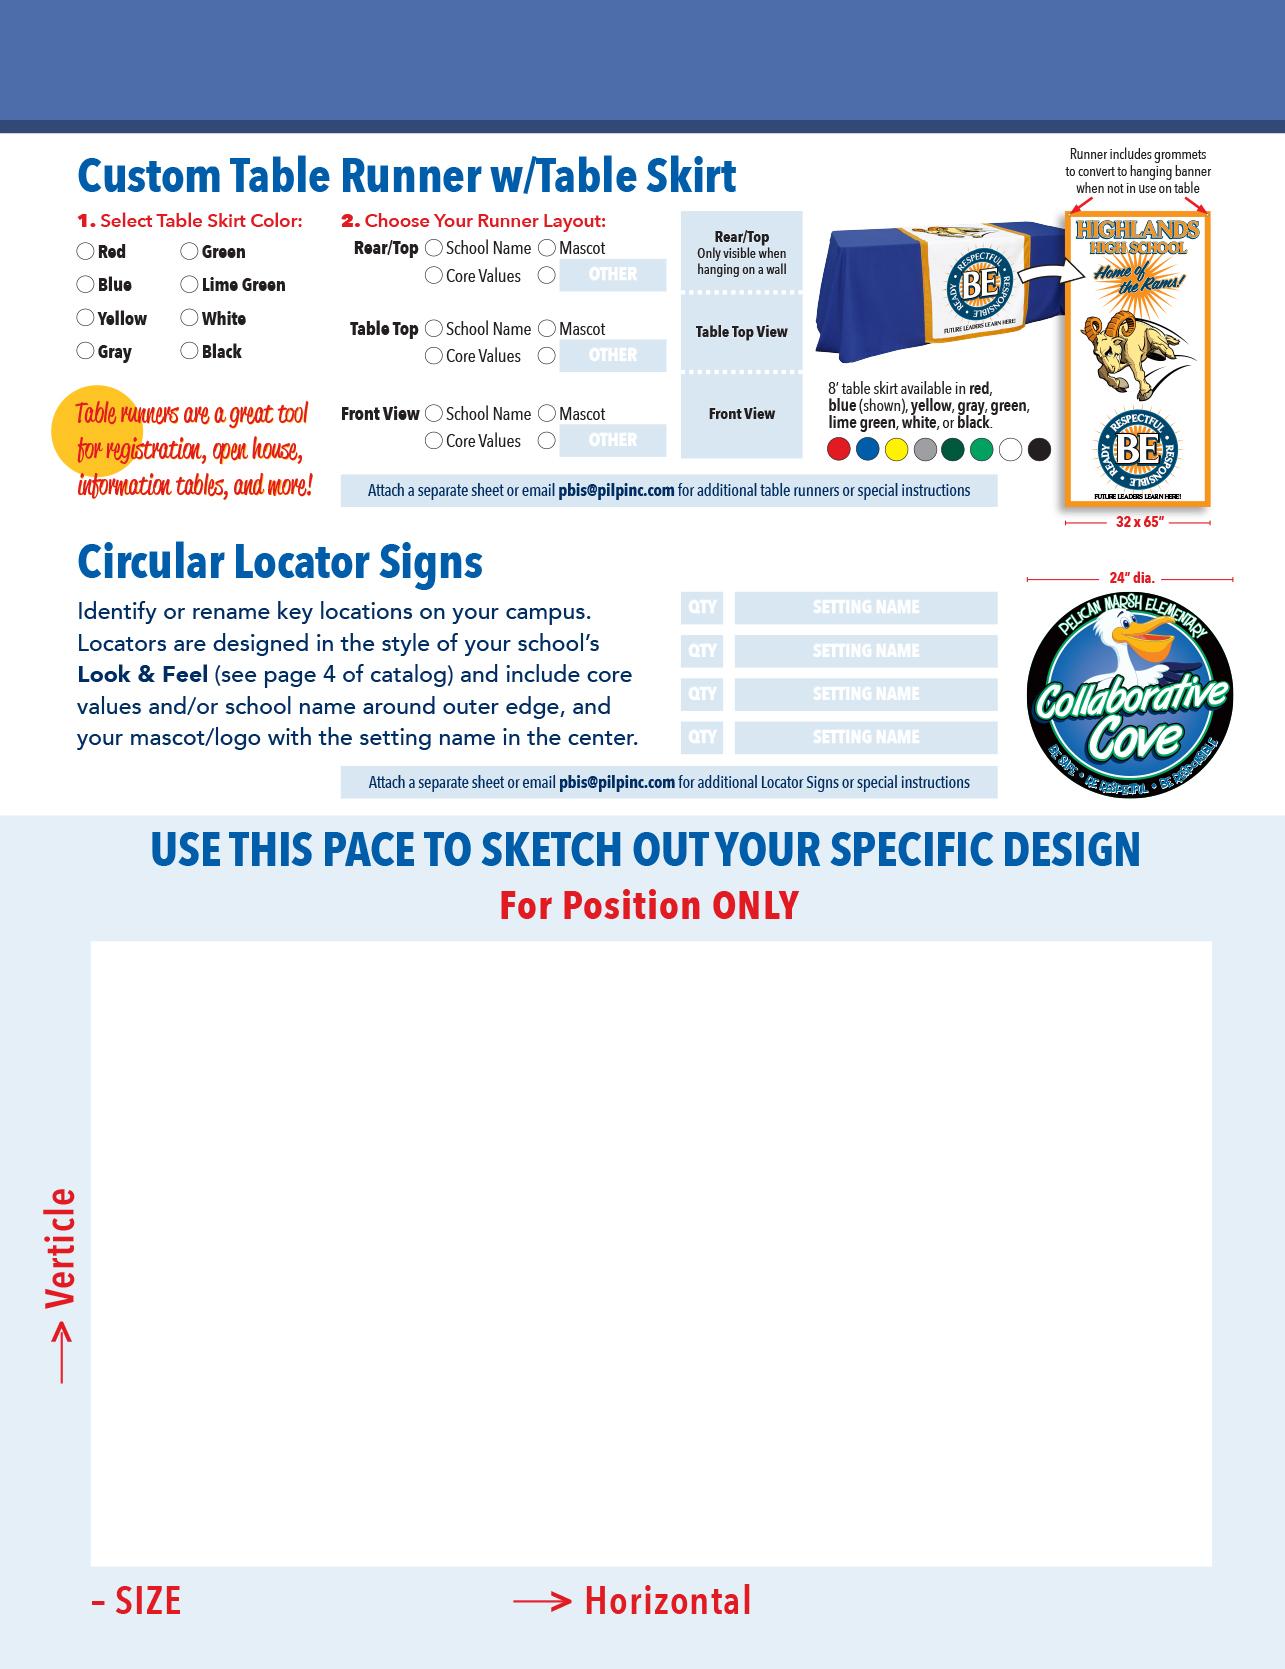 Product Customization Worksheet K12 Branding